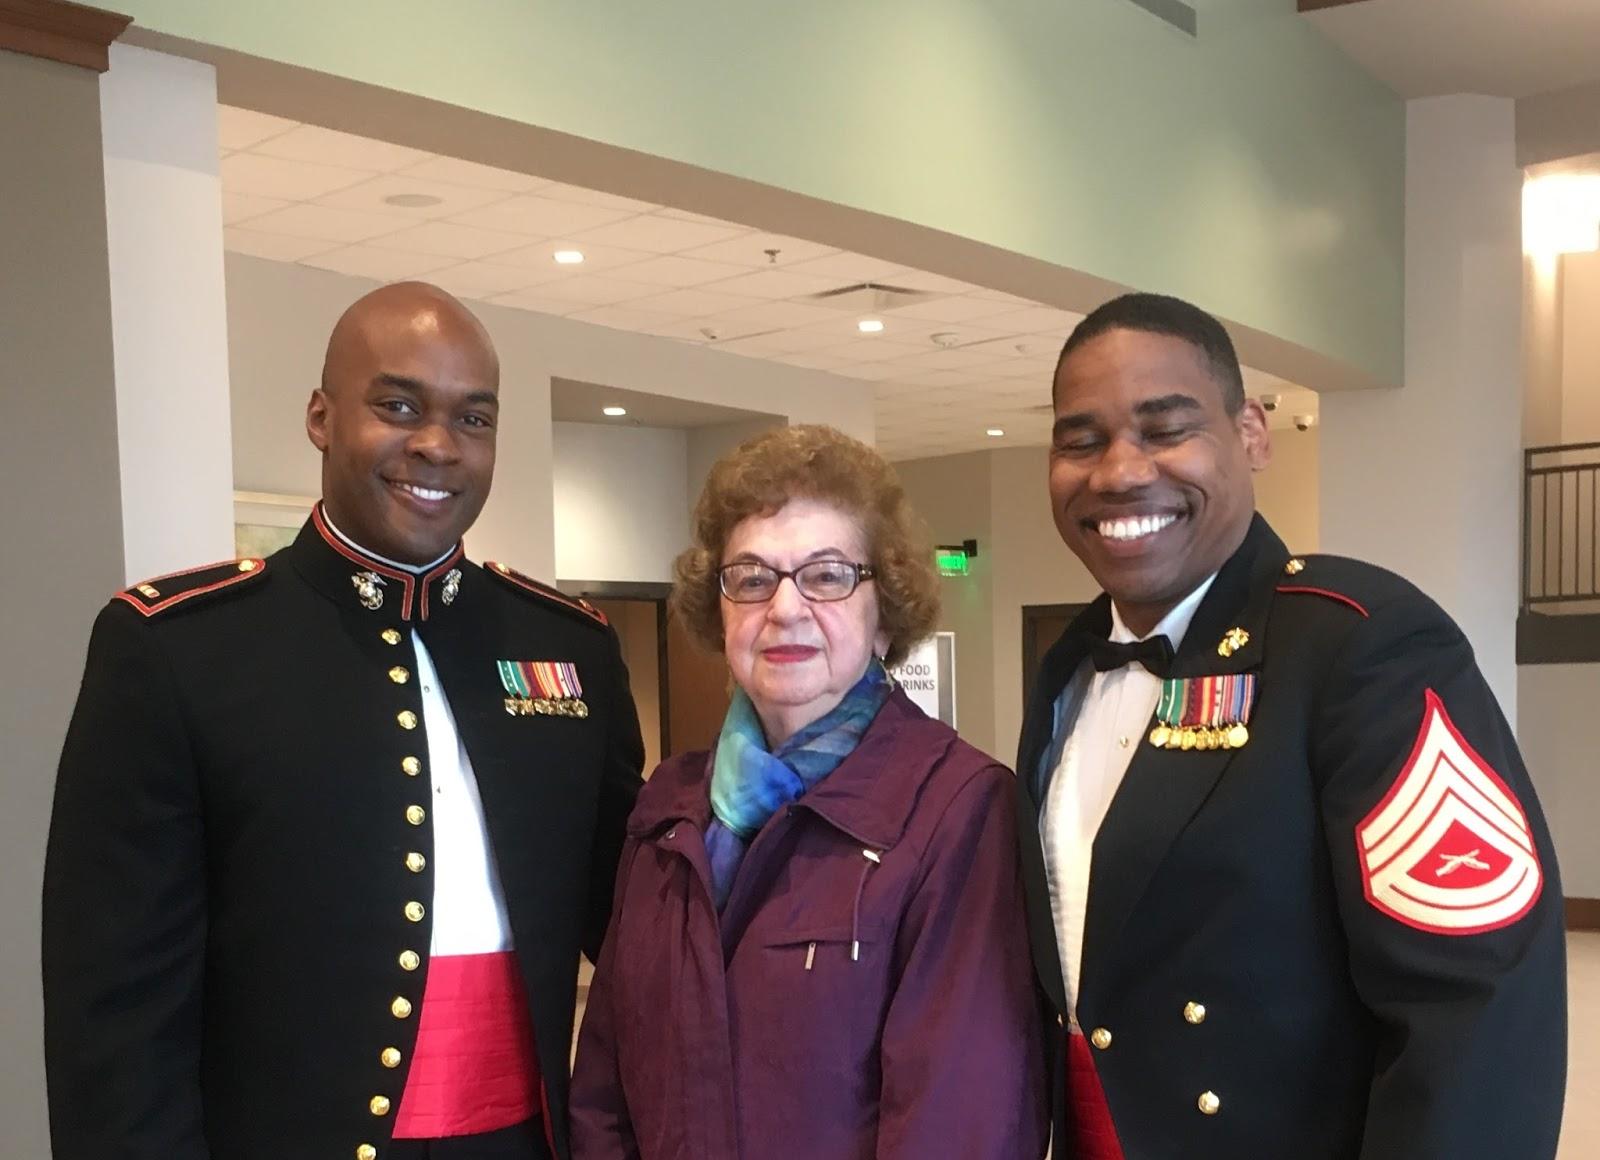 Carroll County Veterans Memorial Park, Georgia: USMC BAND CONCERT